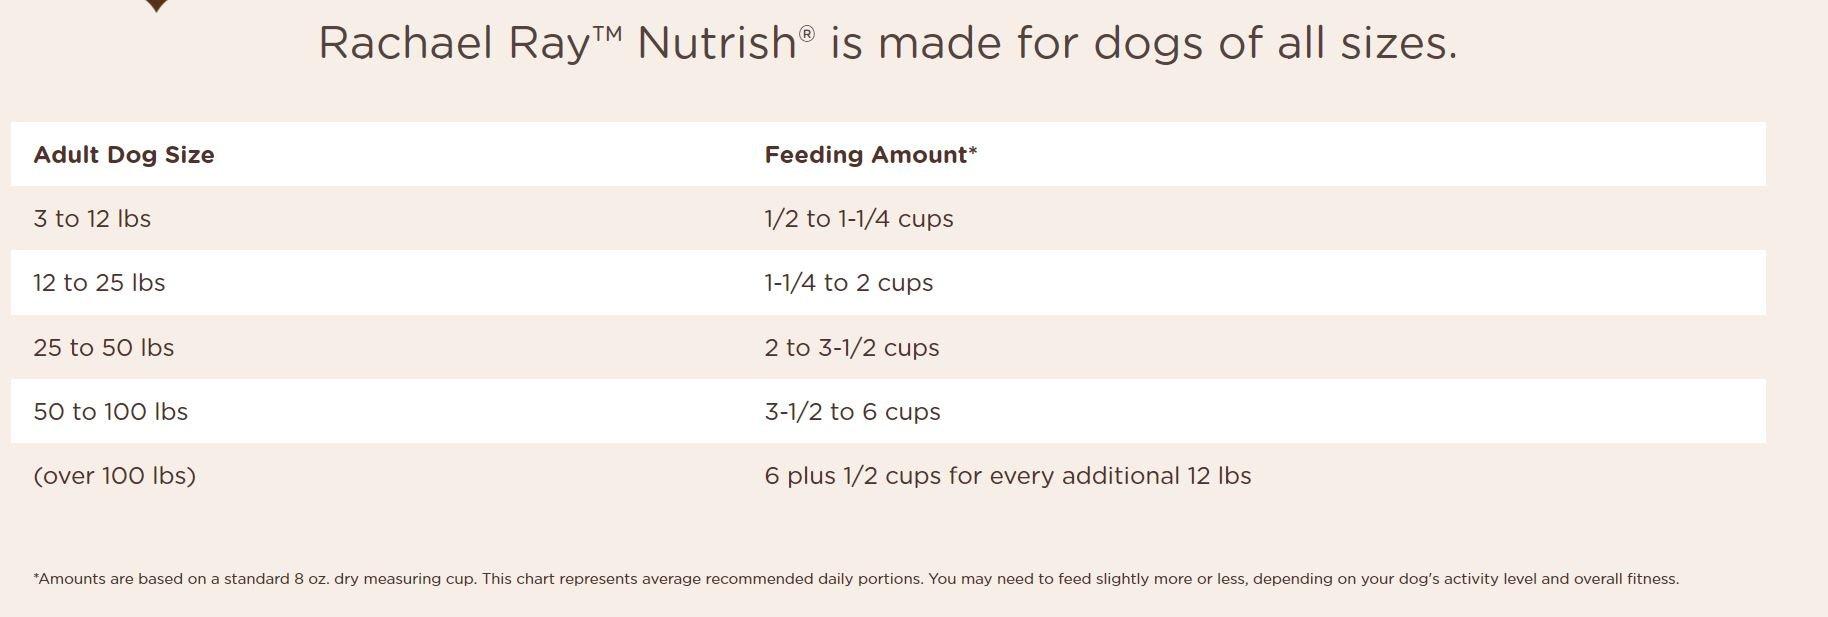 Rachael Ray Nutrish Natural Dry Dog Food, Real Chicken & Veggies Recipe, 28 lbs by Rachael Ray Nutrish (Image #10)